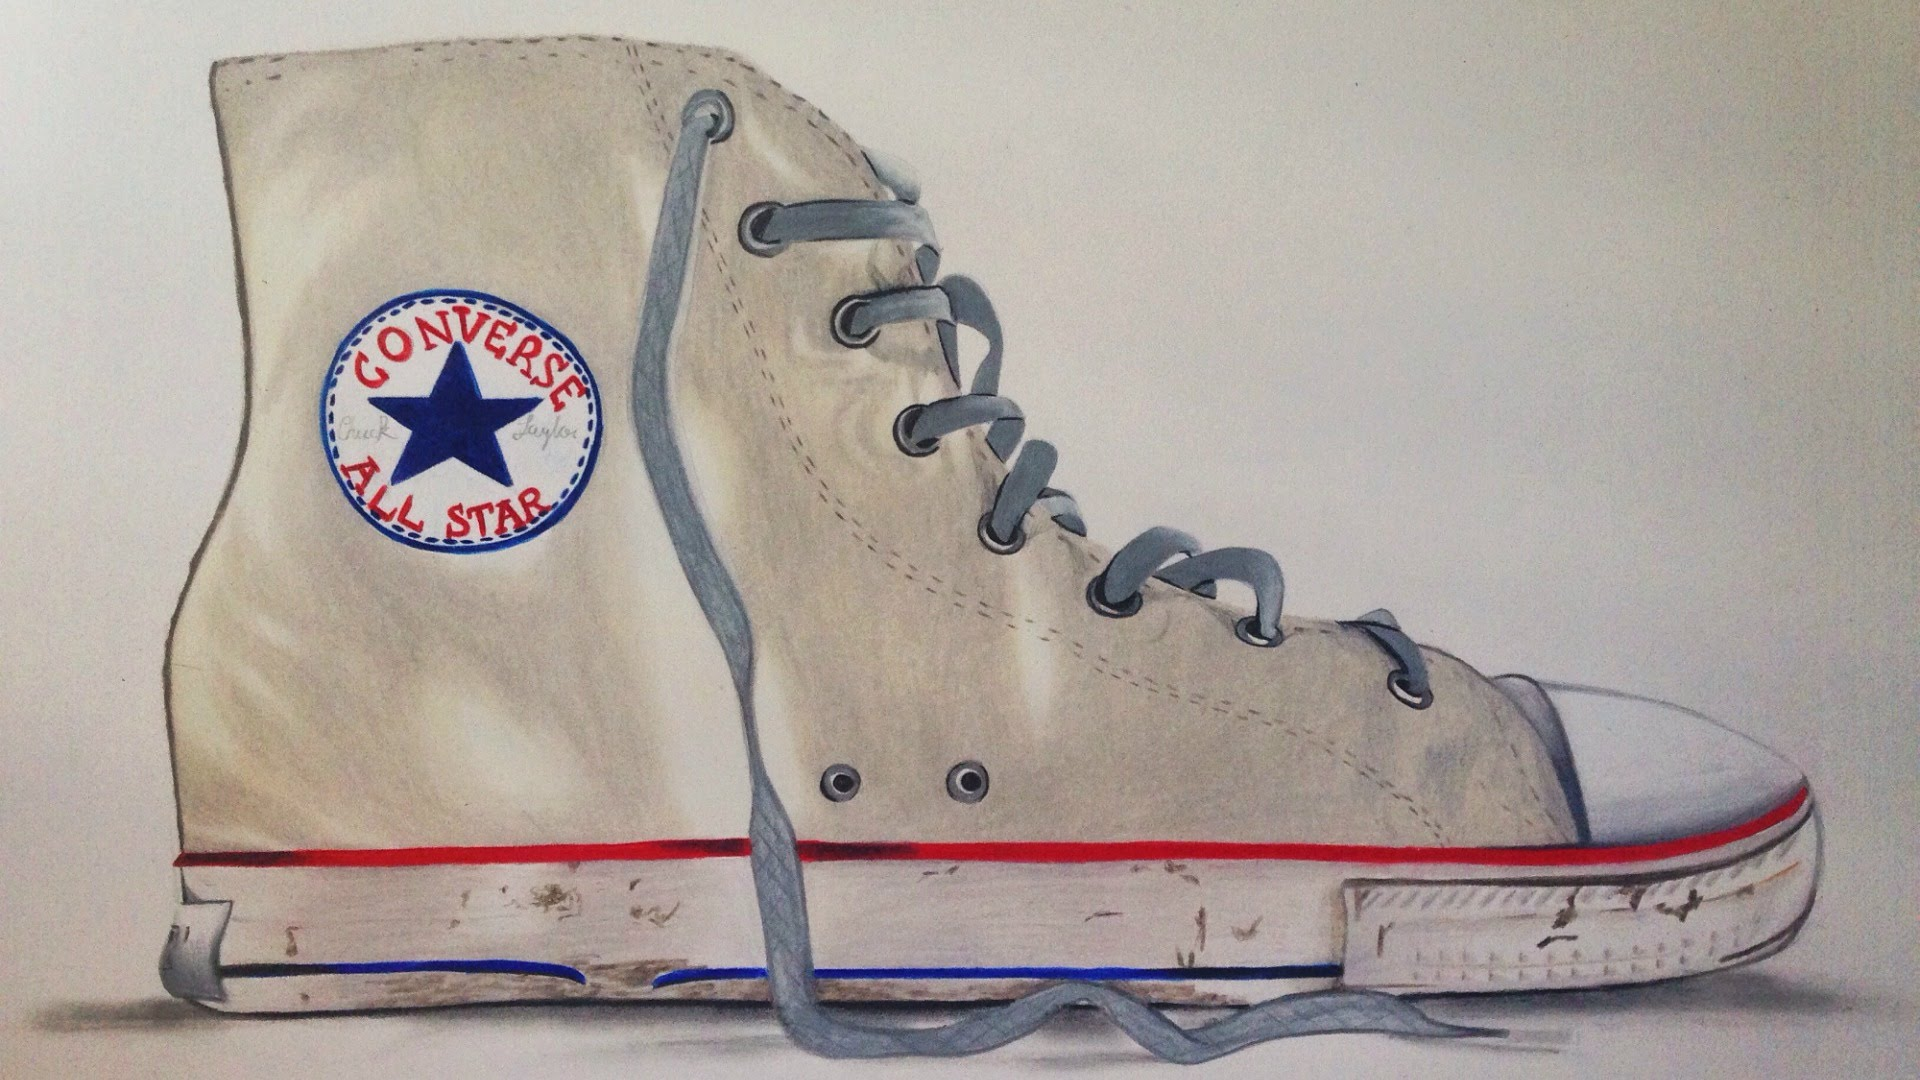 Drawn shoe chuck taylors Converse Chuck YouTube Converse Chuck